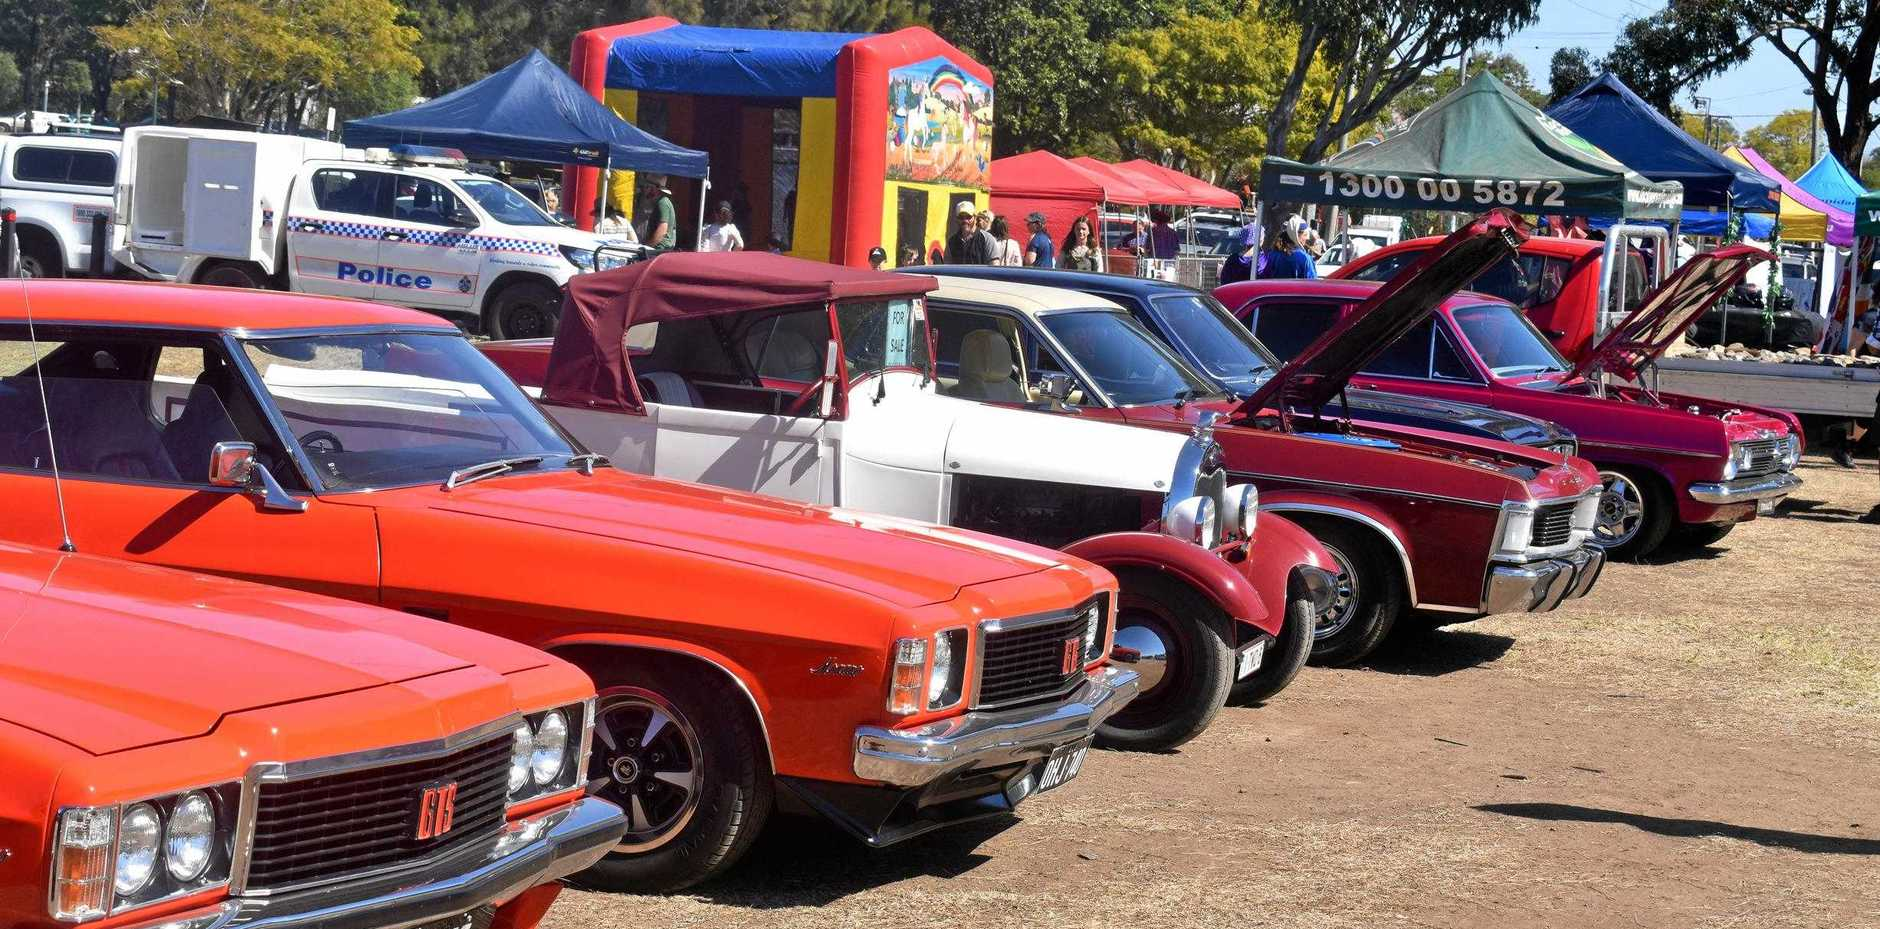 Car display at the festival